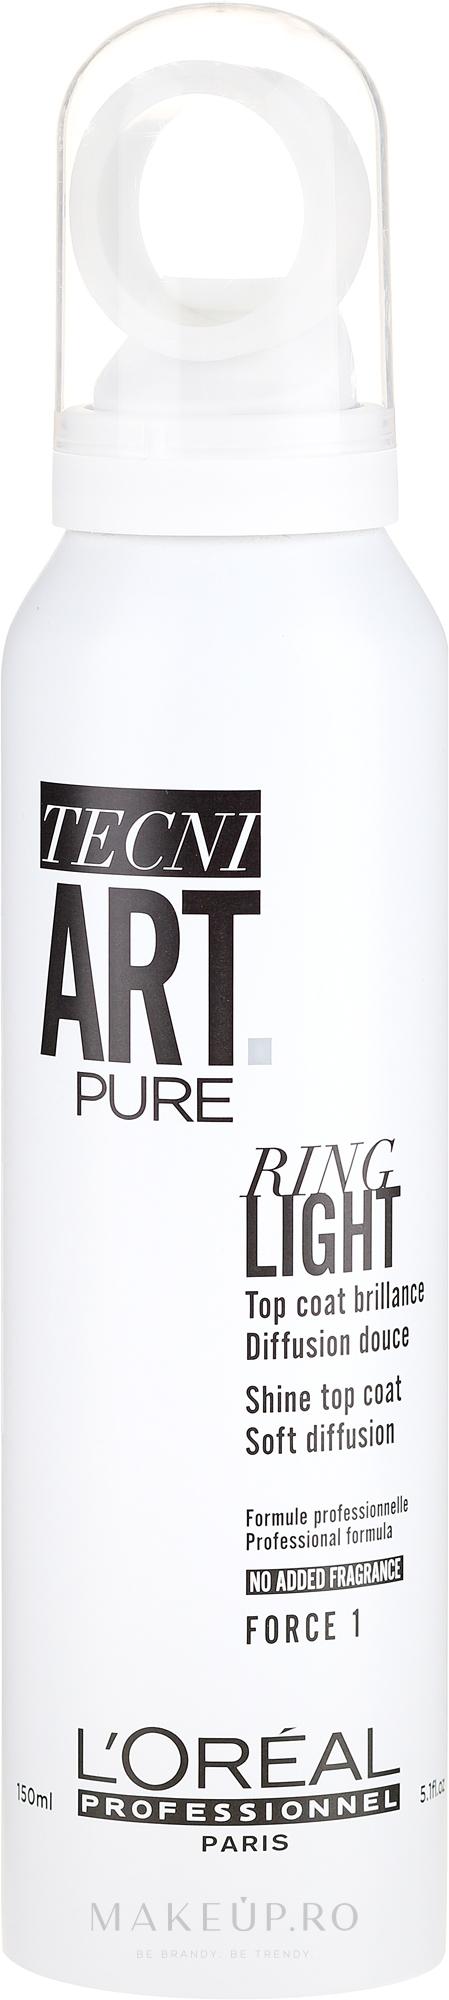 Spray de păr - L'Oreal Professionnel Tecni.art Pure Ring Light Top Coat Brilliance — Imagine 150 ml